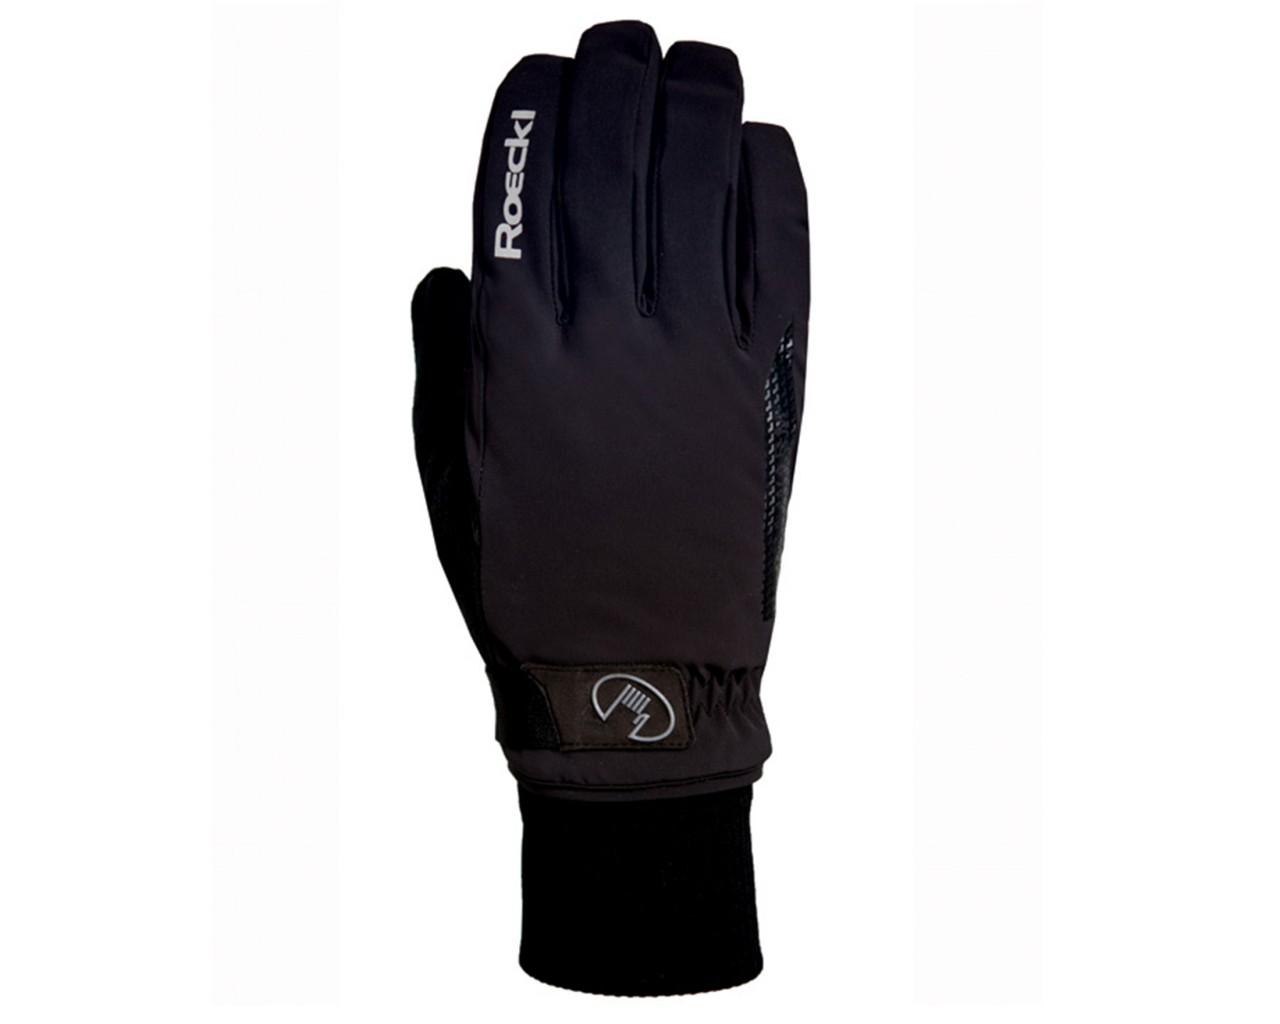 Roeckl Vermes GTX Gore Tex Winter Gloves   black